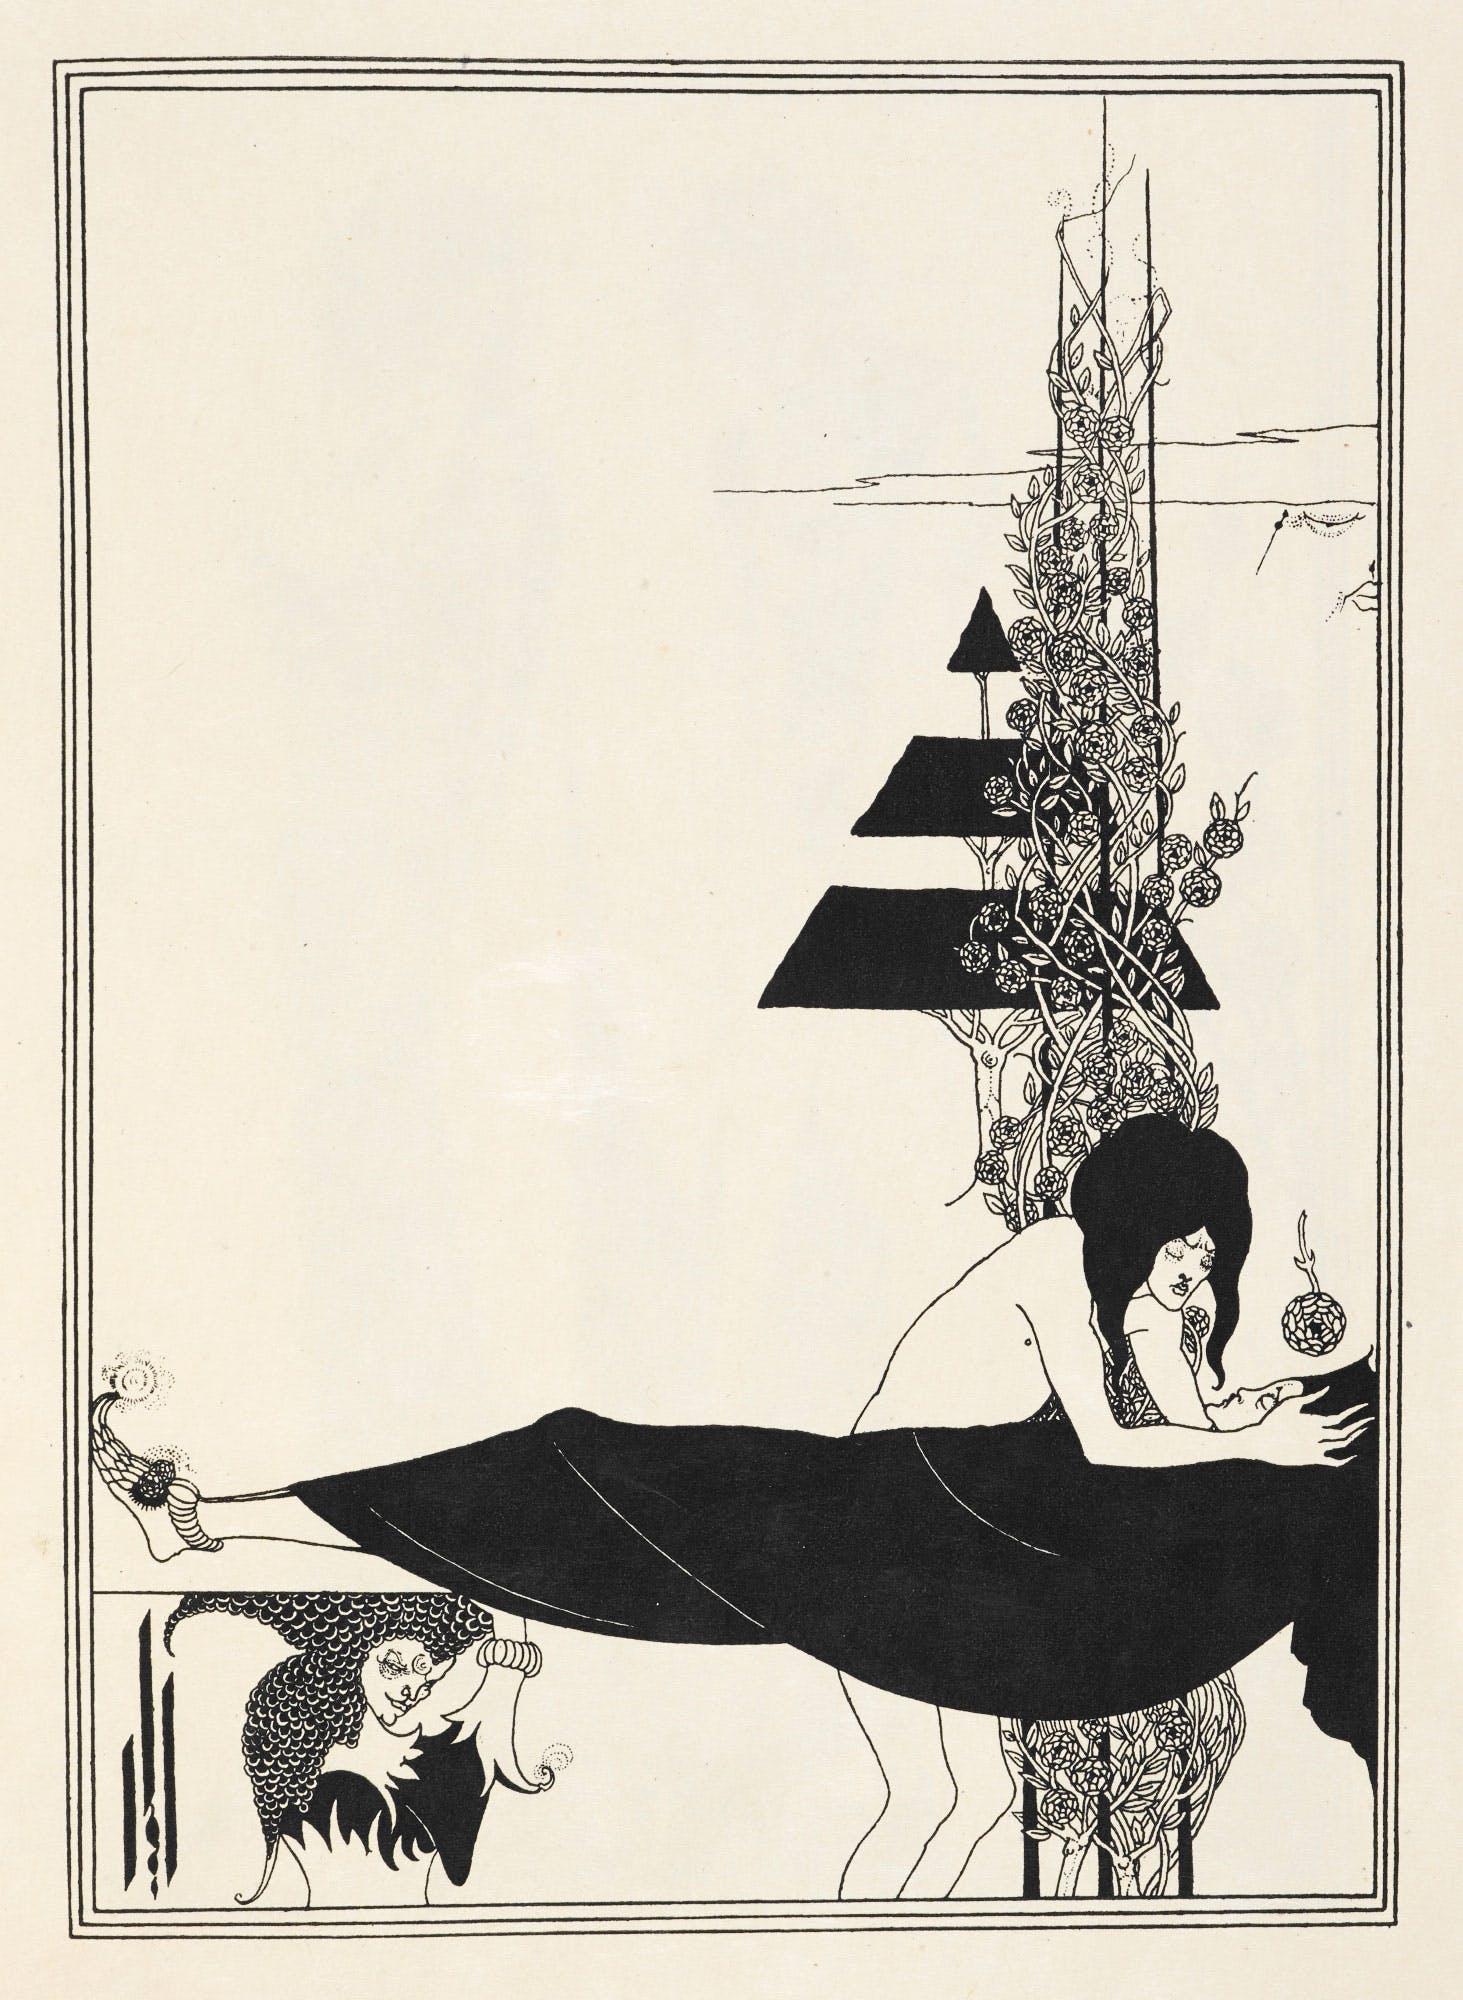 aubrey beardsley illustration 5